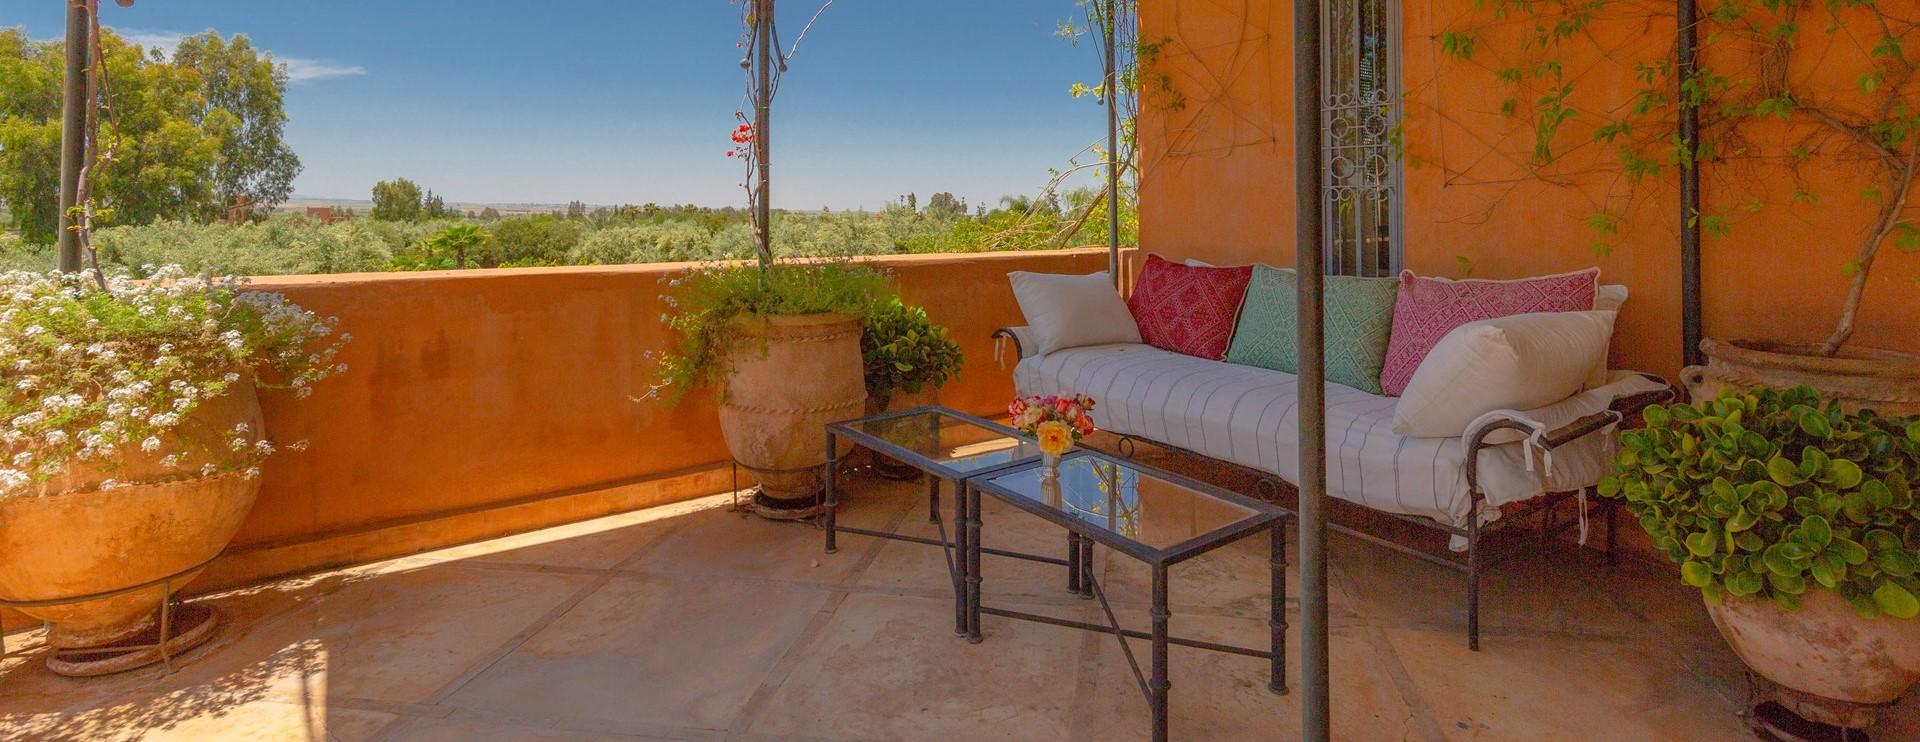 villa-dar-tourtite-master-bedroom-terrac